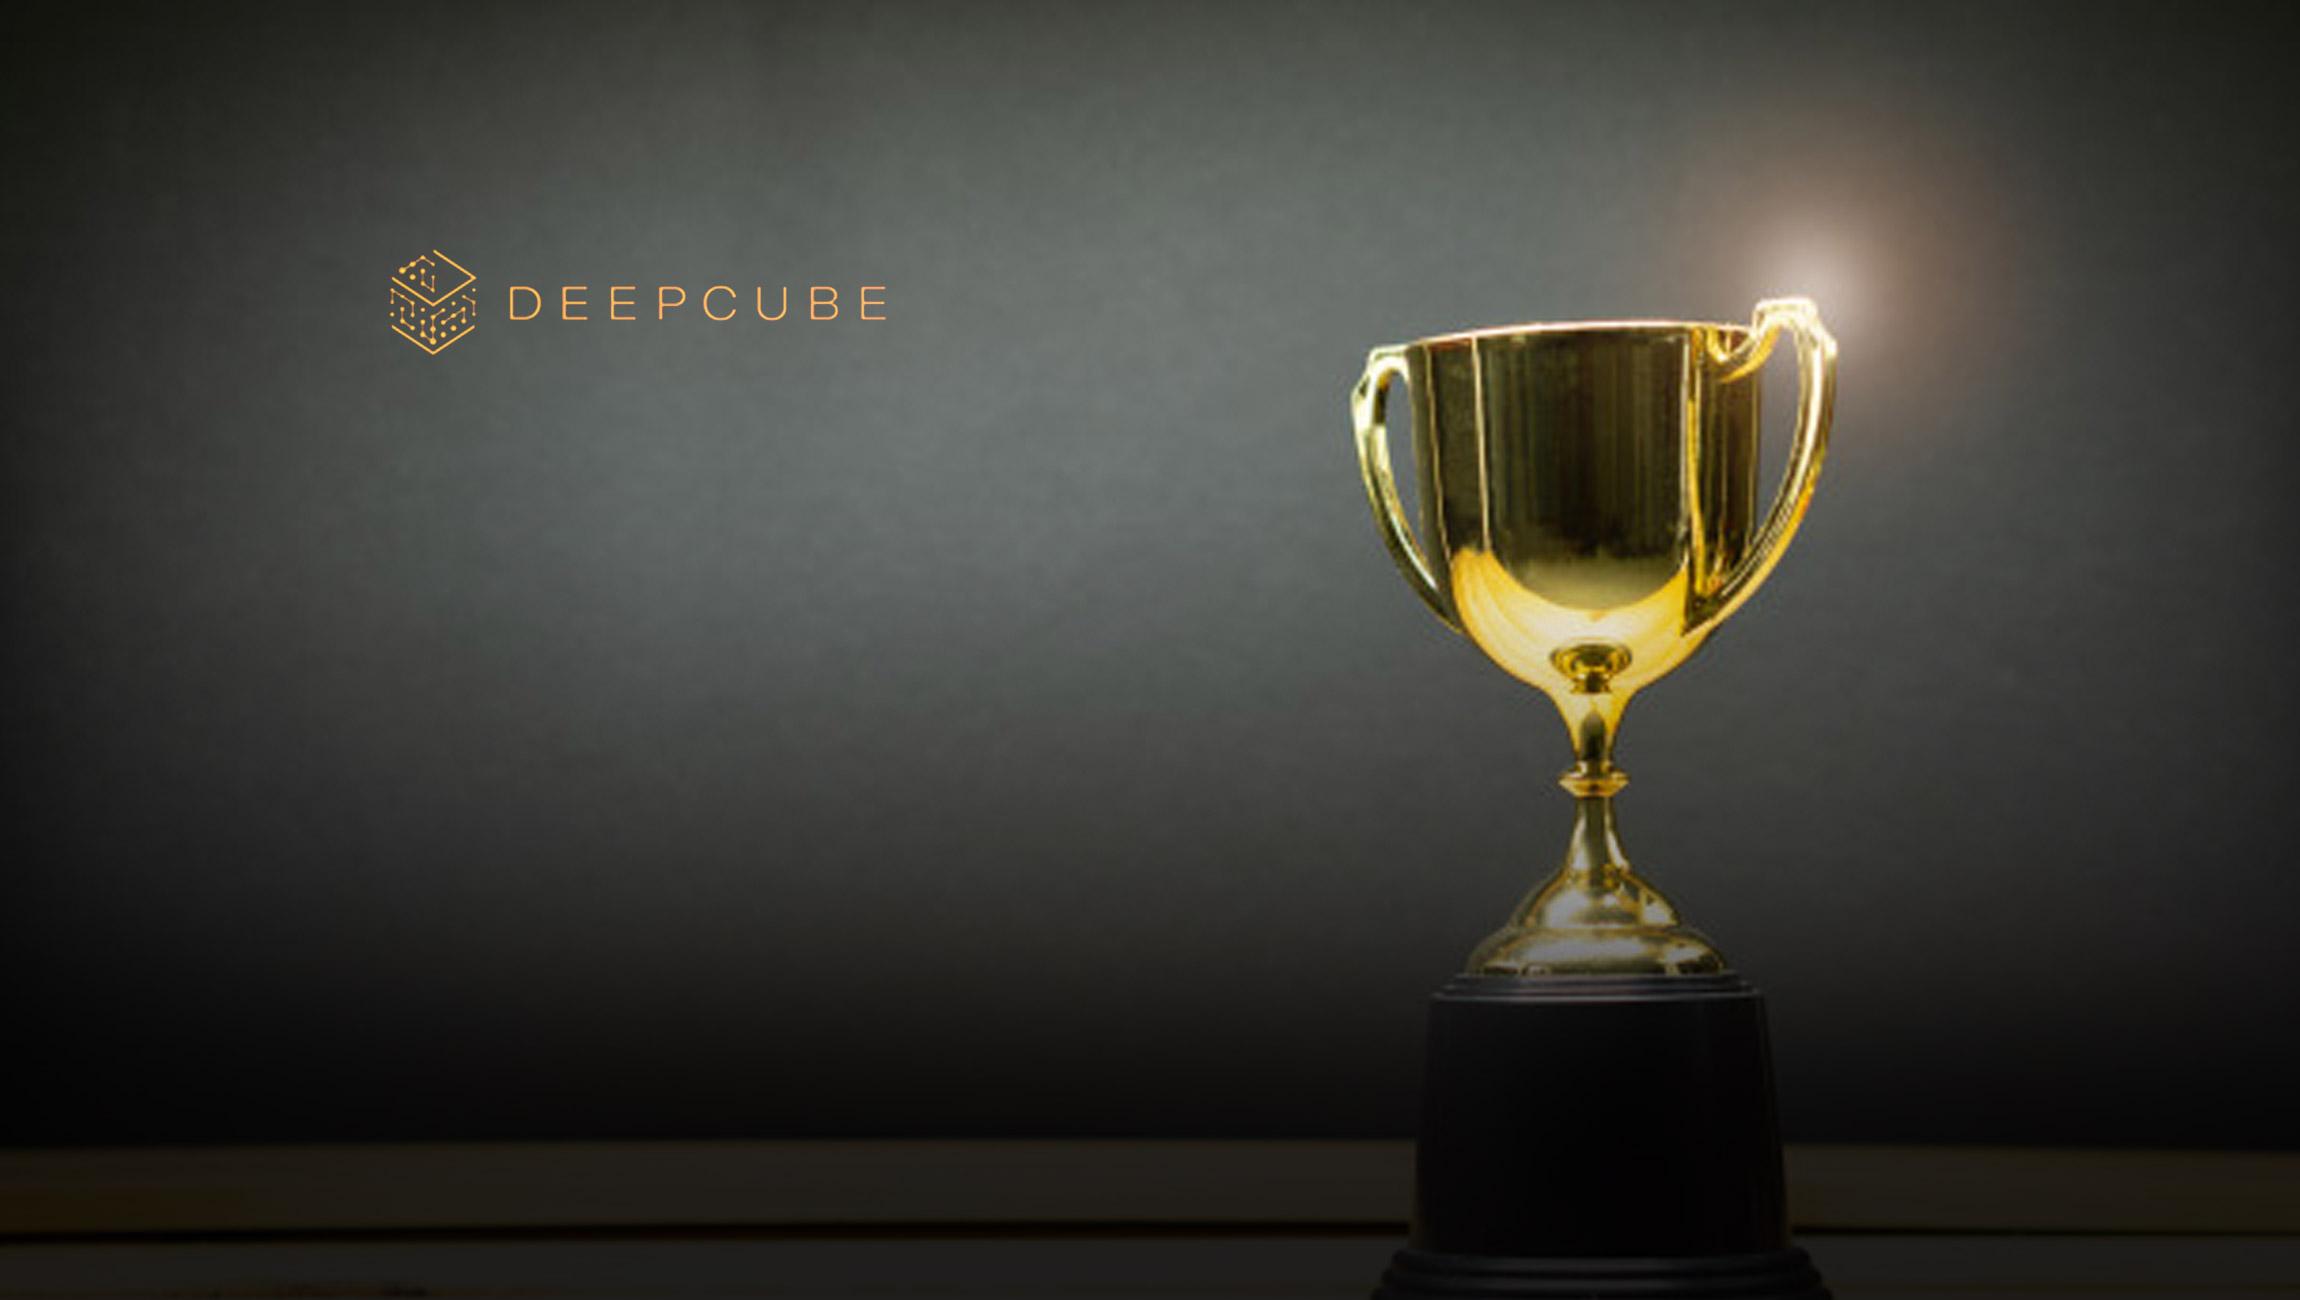 DeepCube's-Deep-Learning-Acceleration-Platform-Wins-Seven-Industry-Awards-in-Nine-Months